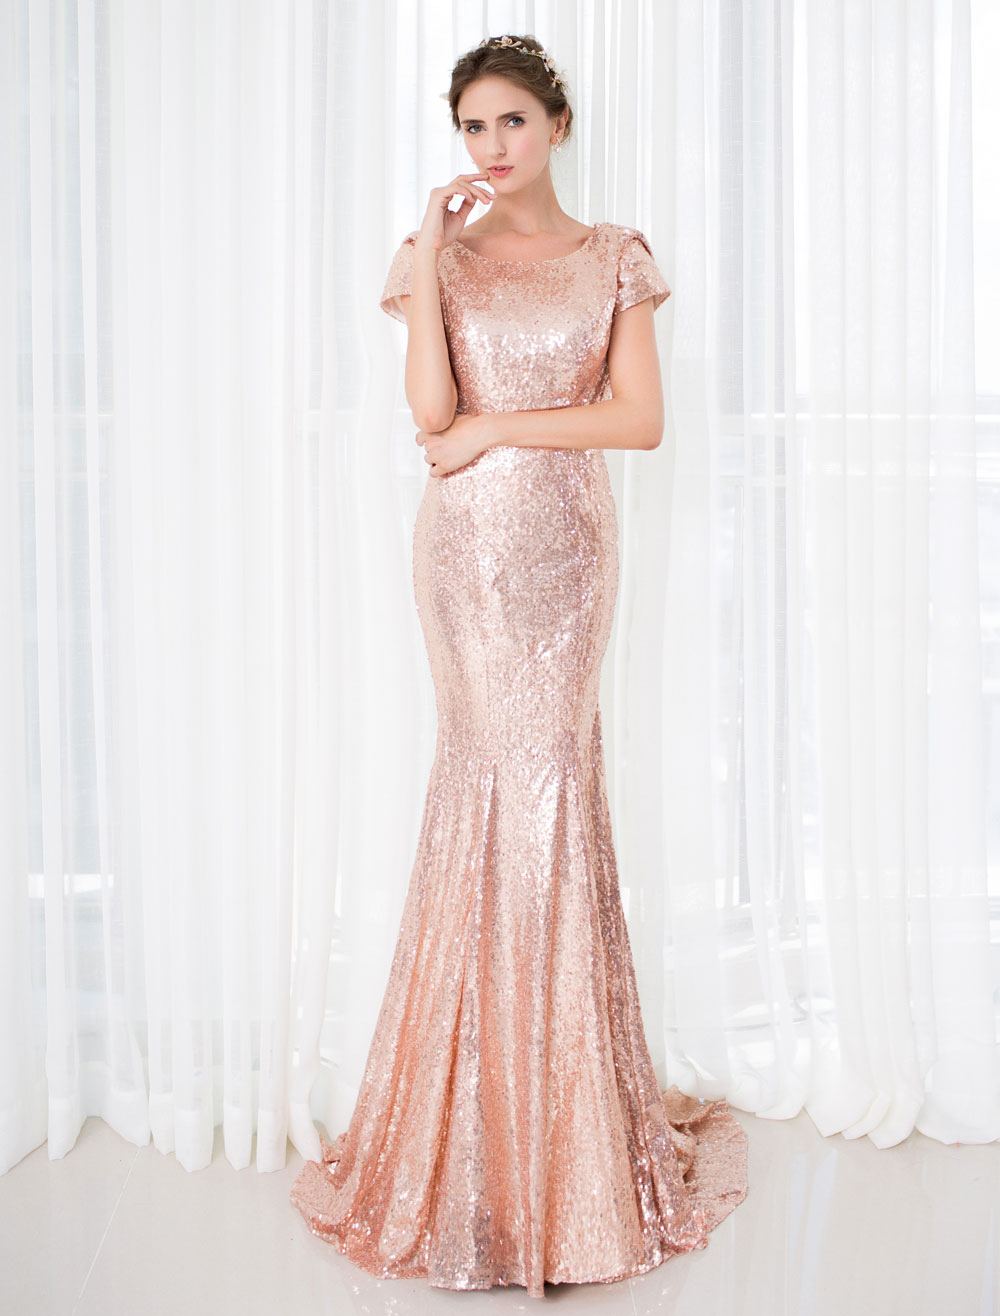 eb5eec9bfd17 Rose Gold Prom Dresses 2019 Long Nude Mermaid Backless Evening Dress Sequin Court  Train Short Sleeve Red Carpet Dress wedding guest dress - Milanoo.com